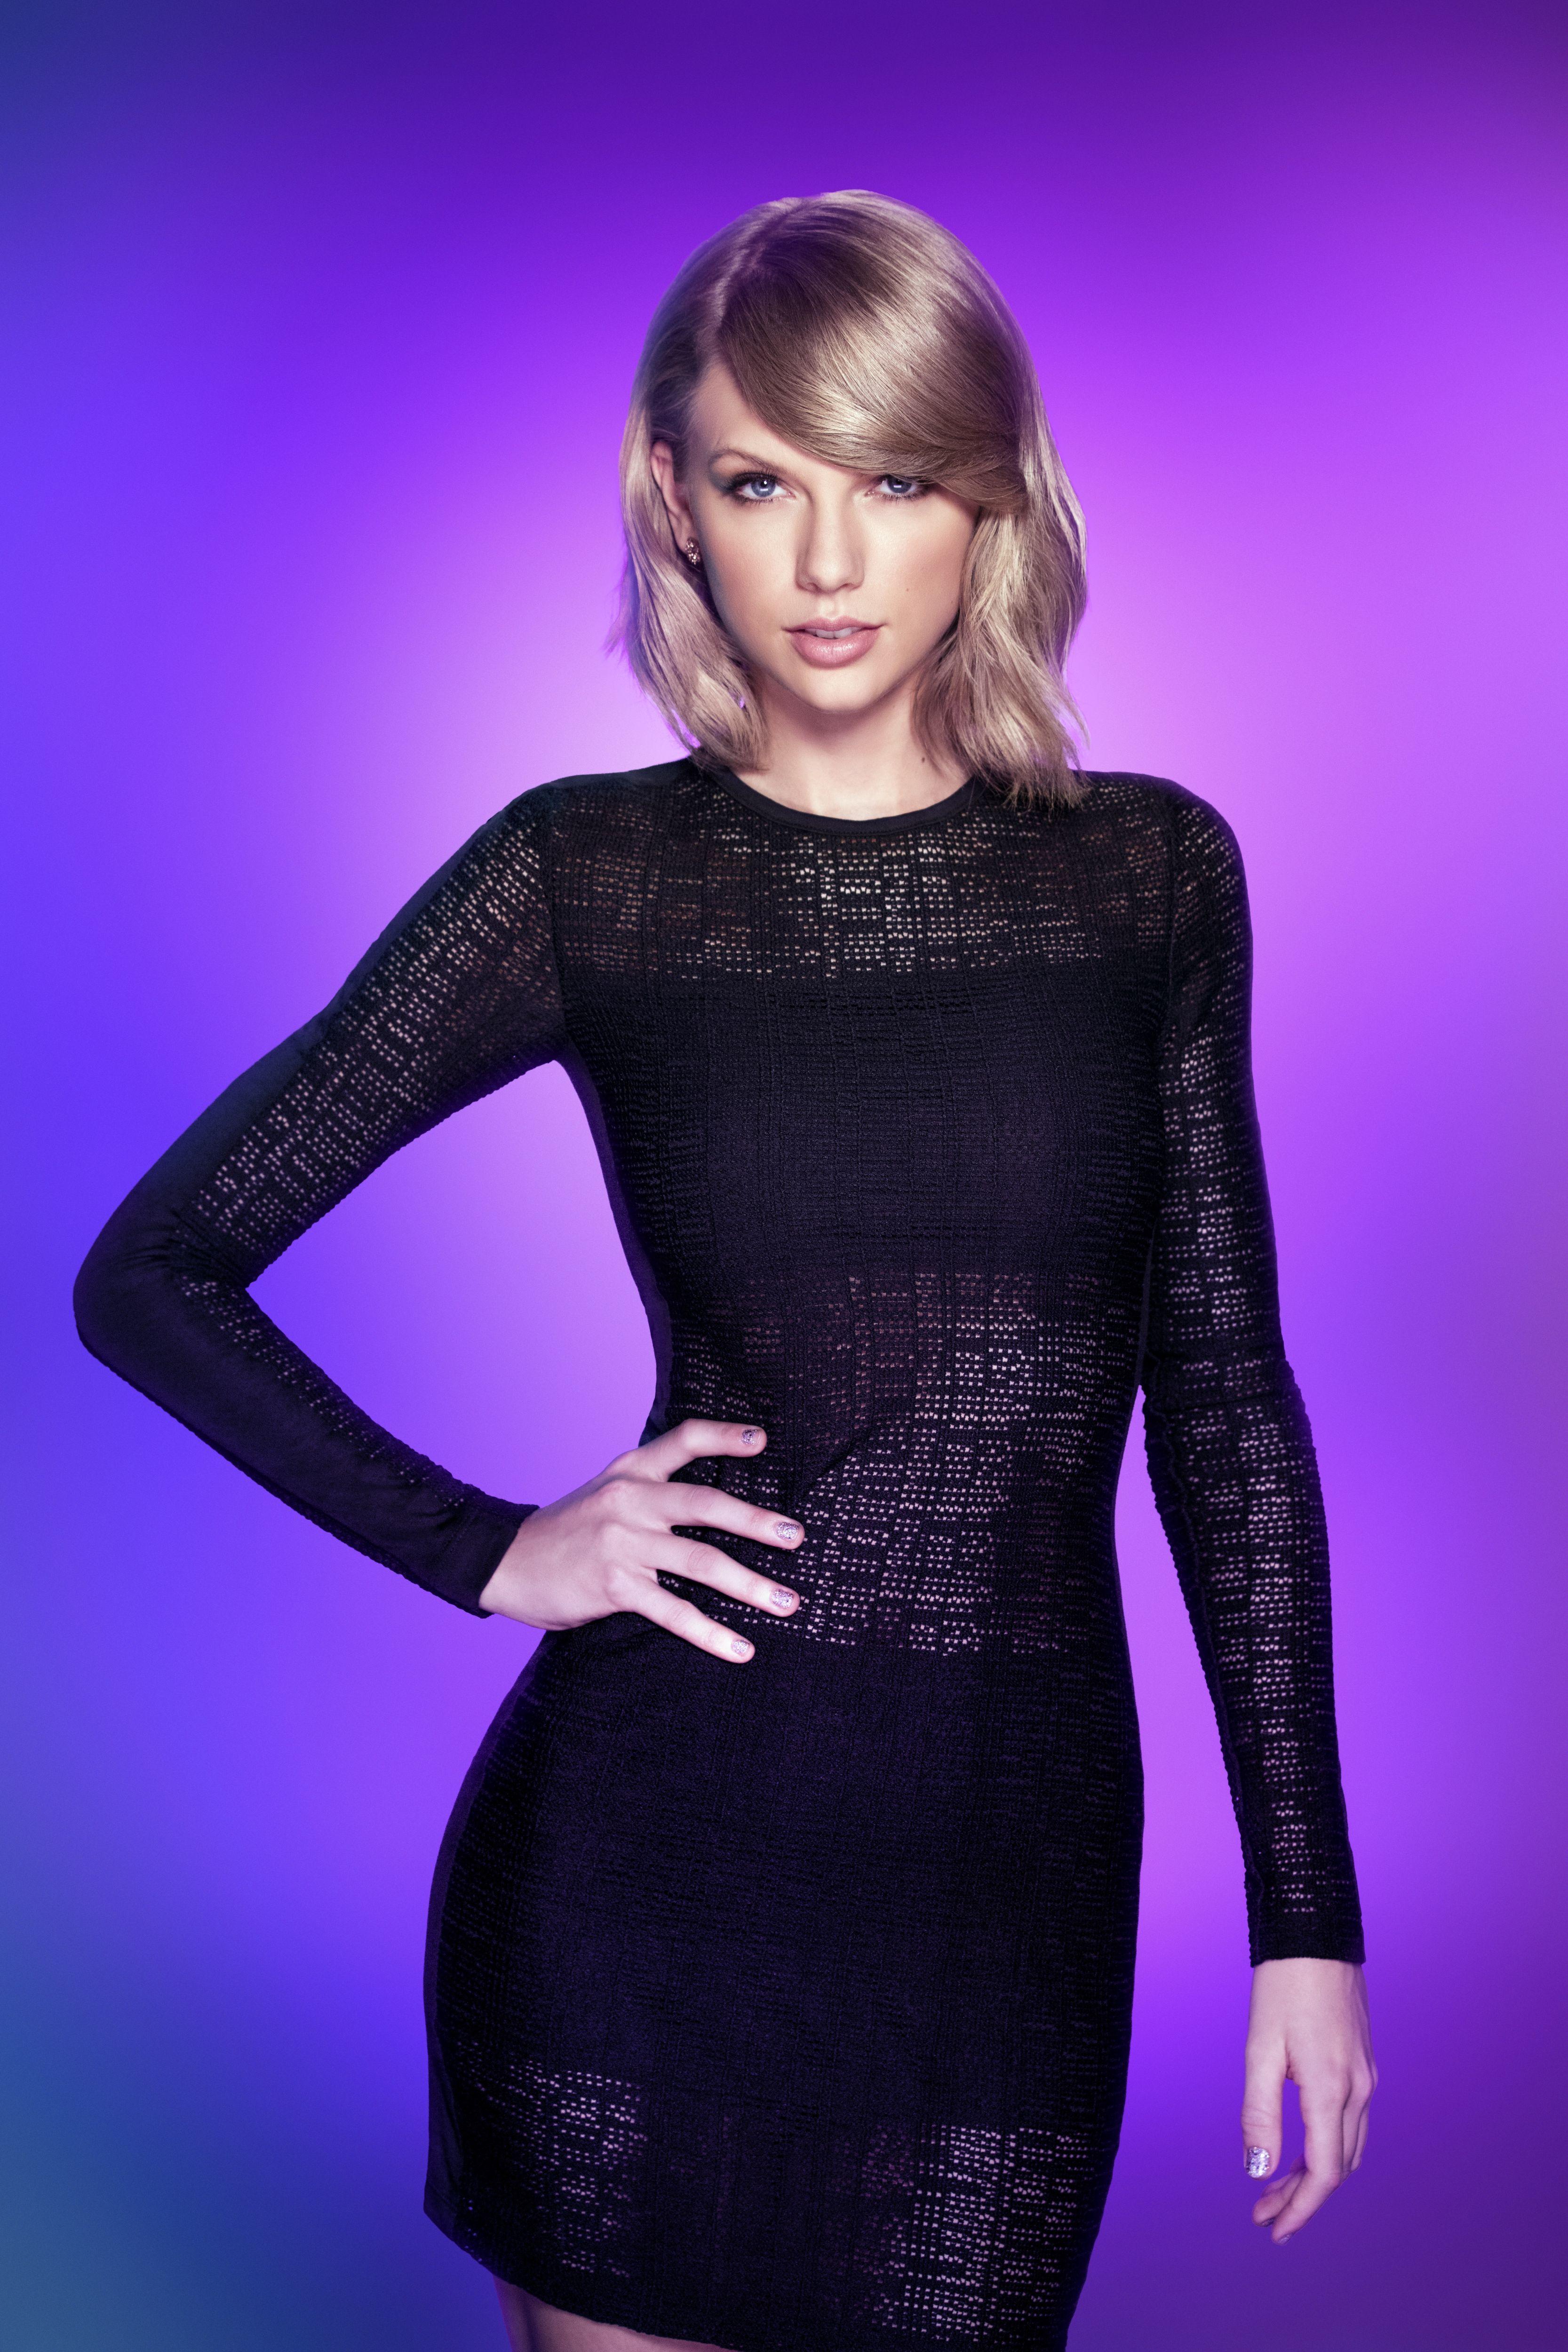 Swift pics taylor hot In Pics;